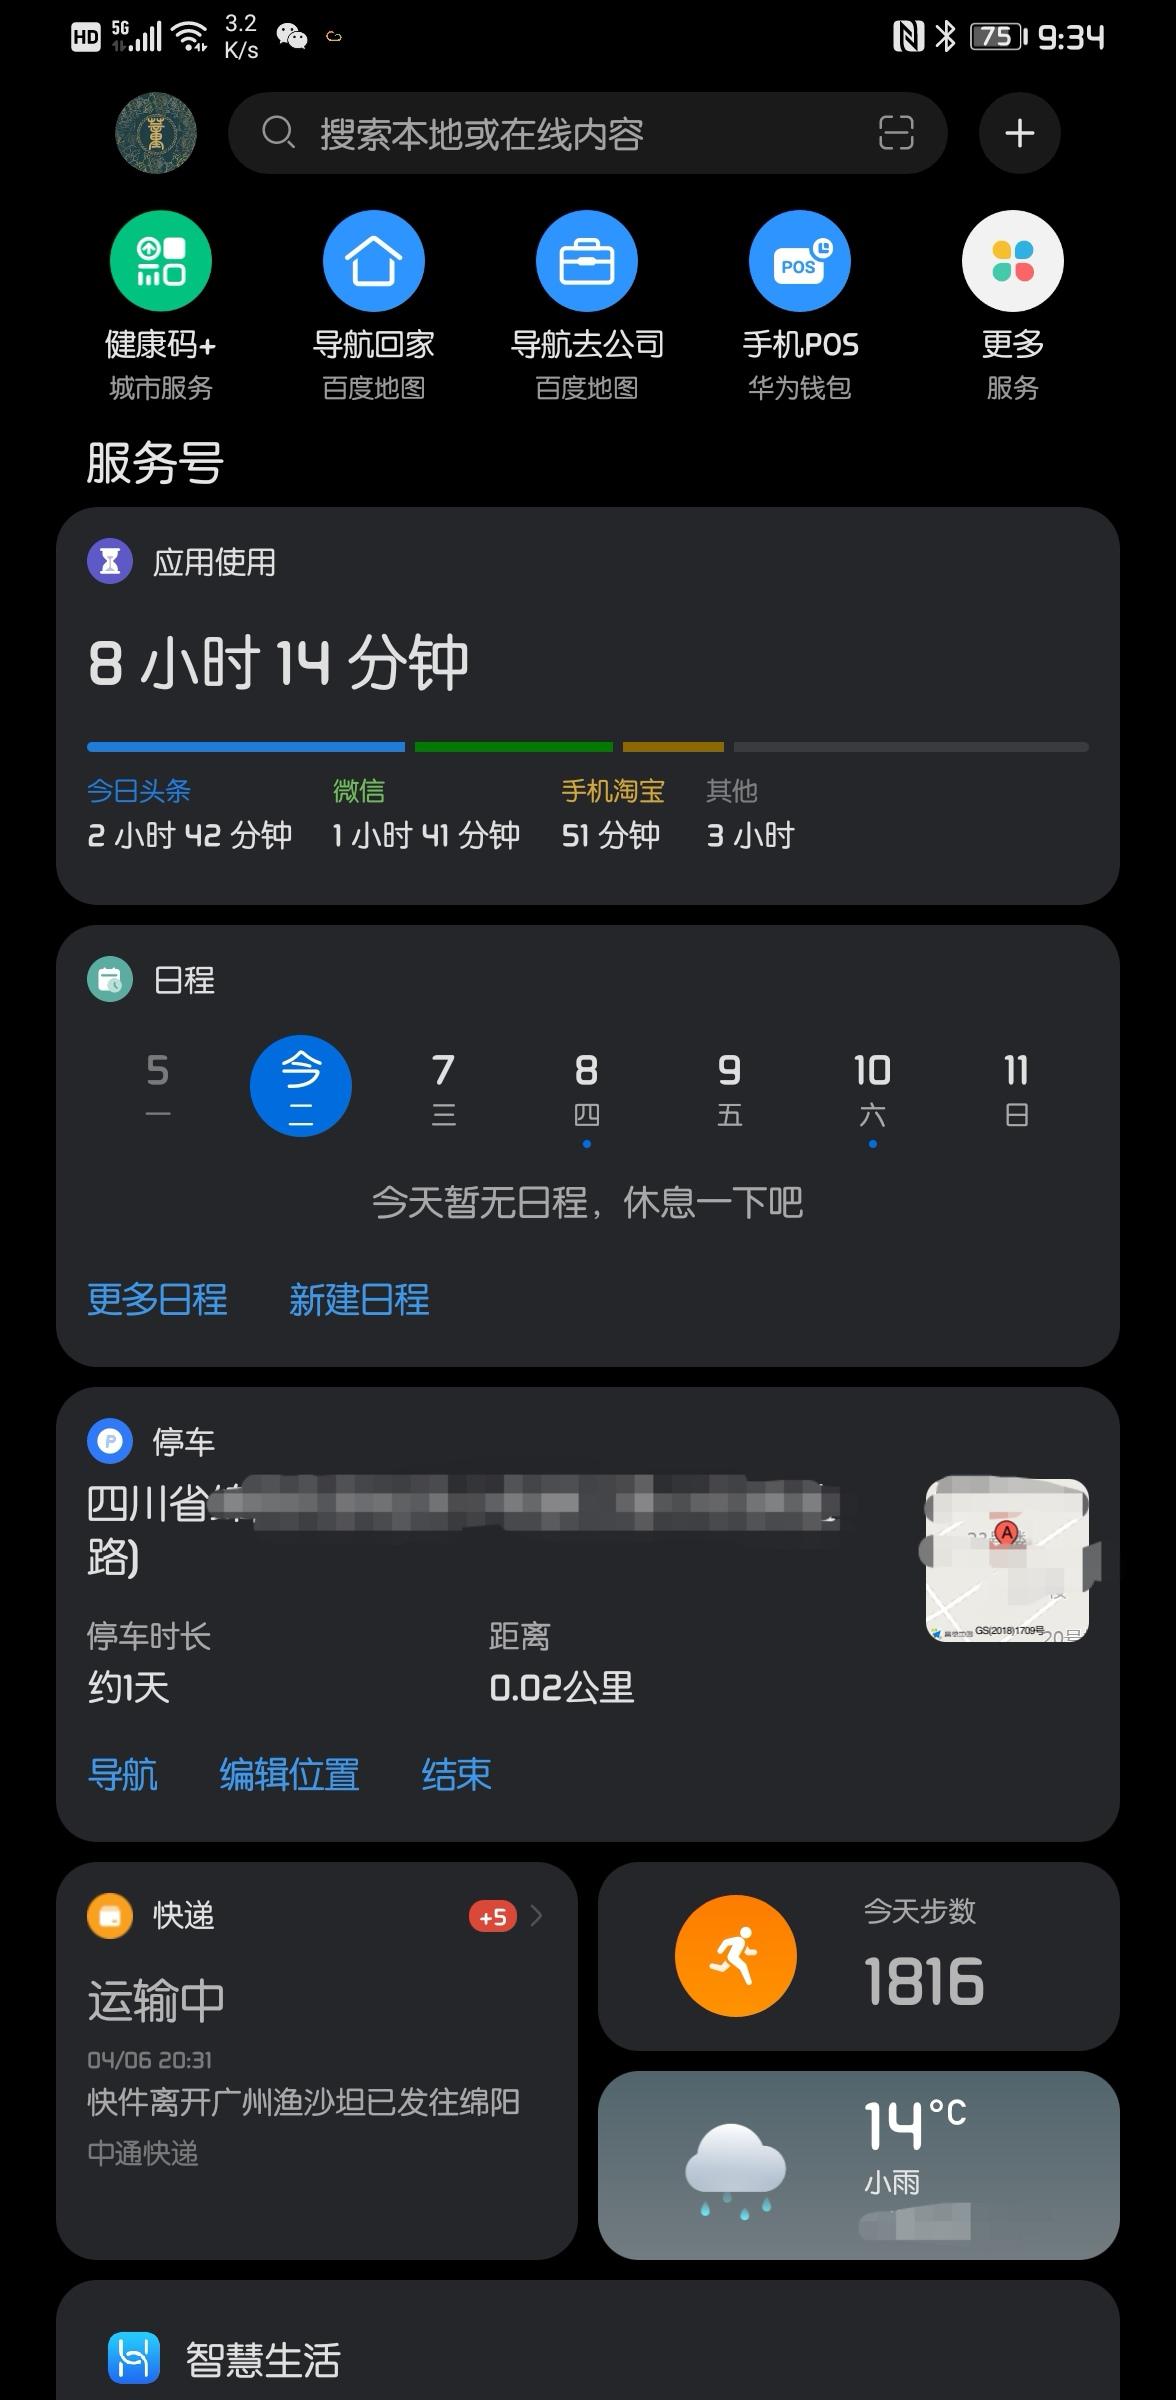 Screenshot_20210406_213408_com.huawei.android.lau.jpg